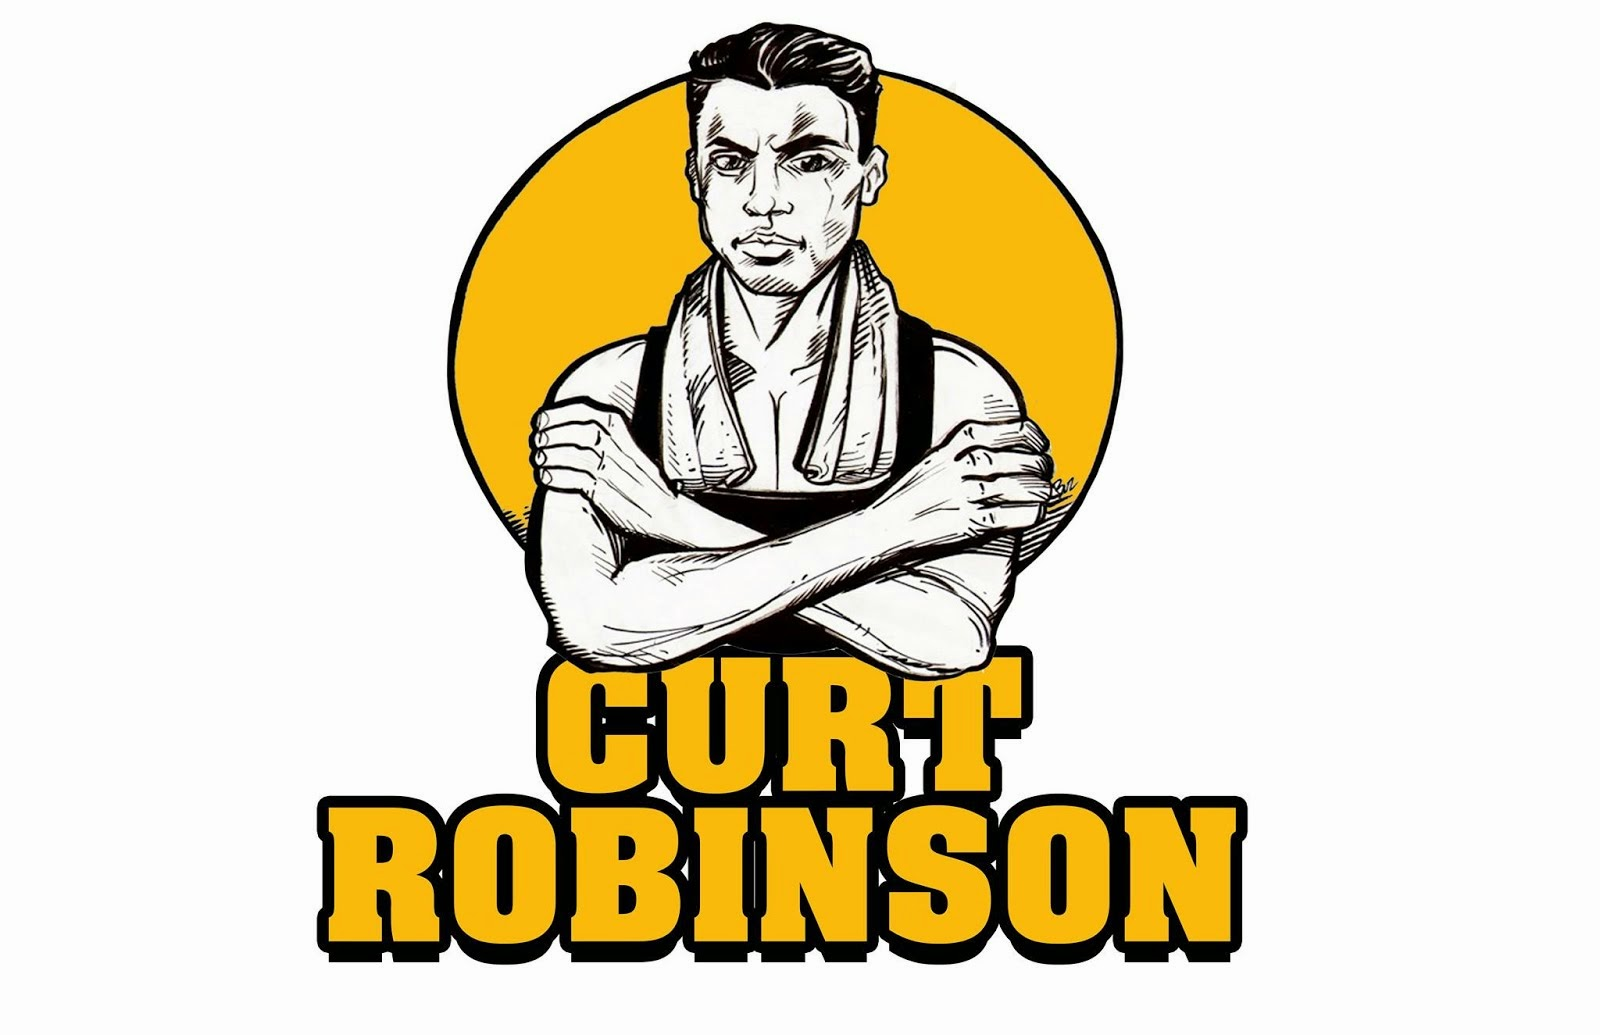 Curt Robinson